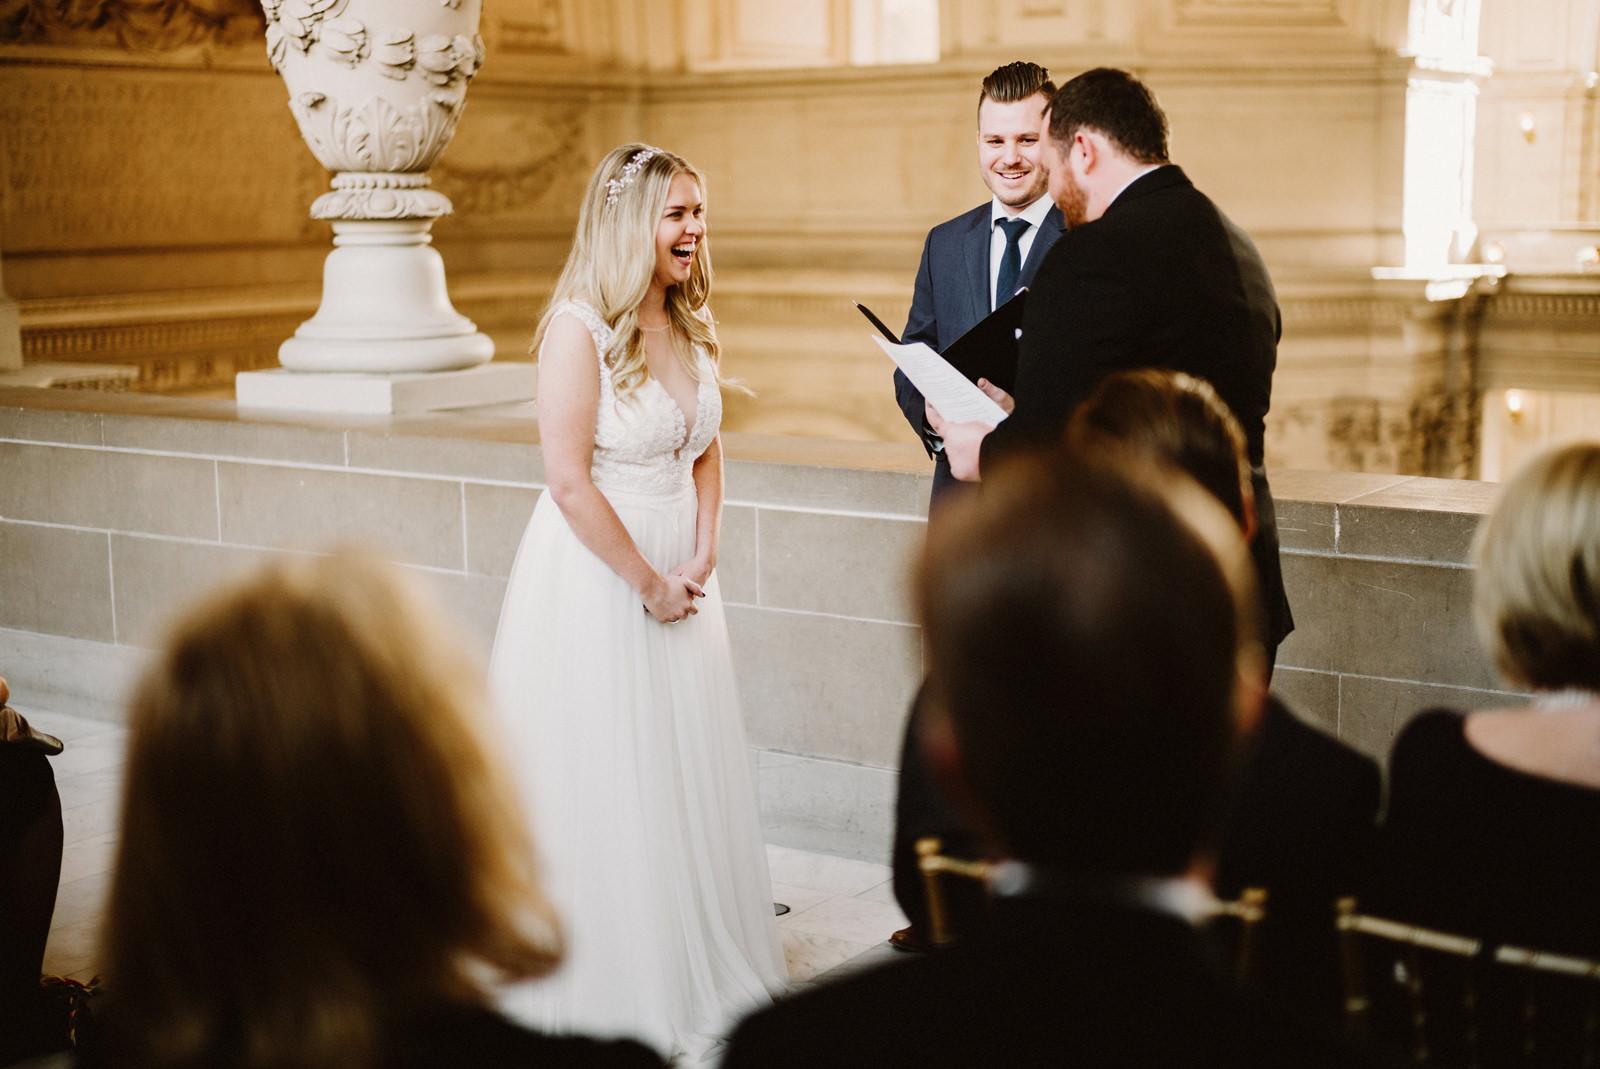 san-francisco-city-hall-elopement-19 SAN FRANCISCO CITY HALL INTIMATE WEDDING